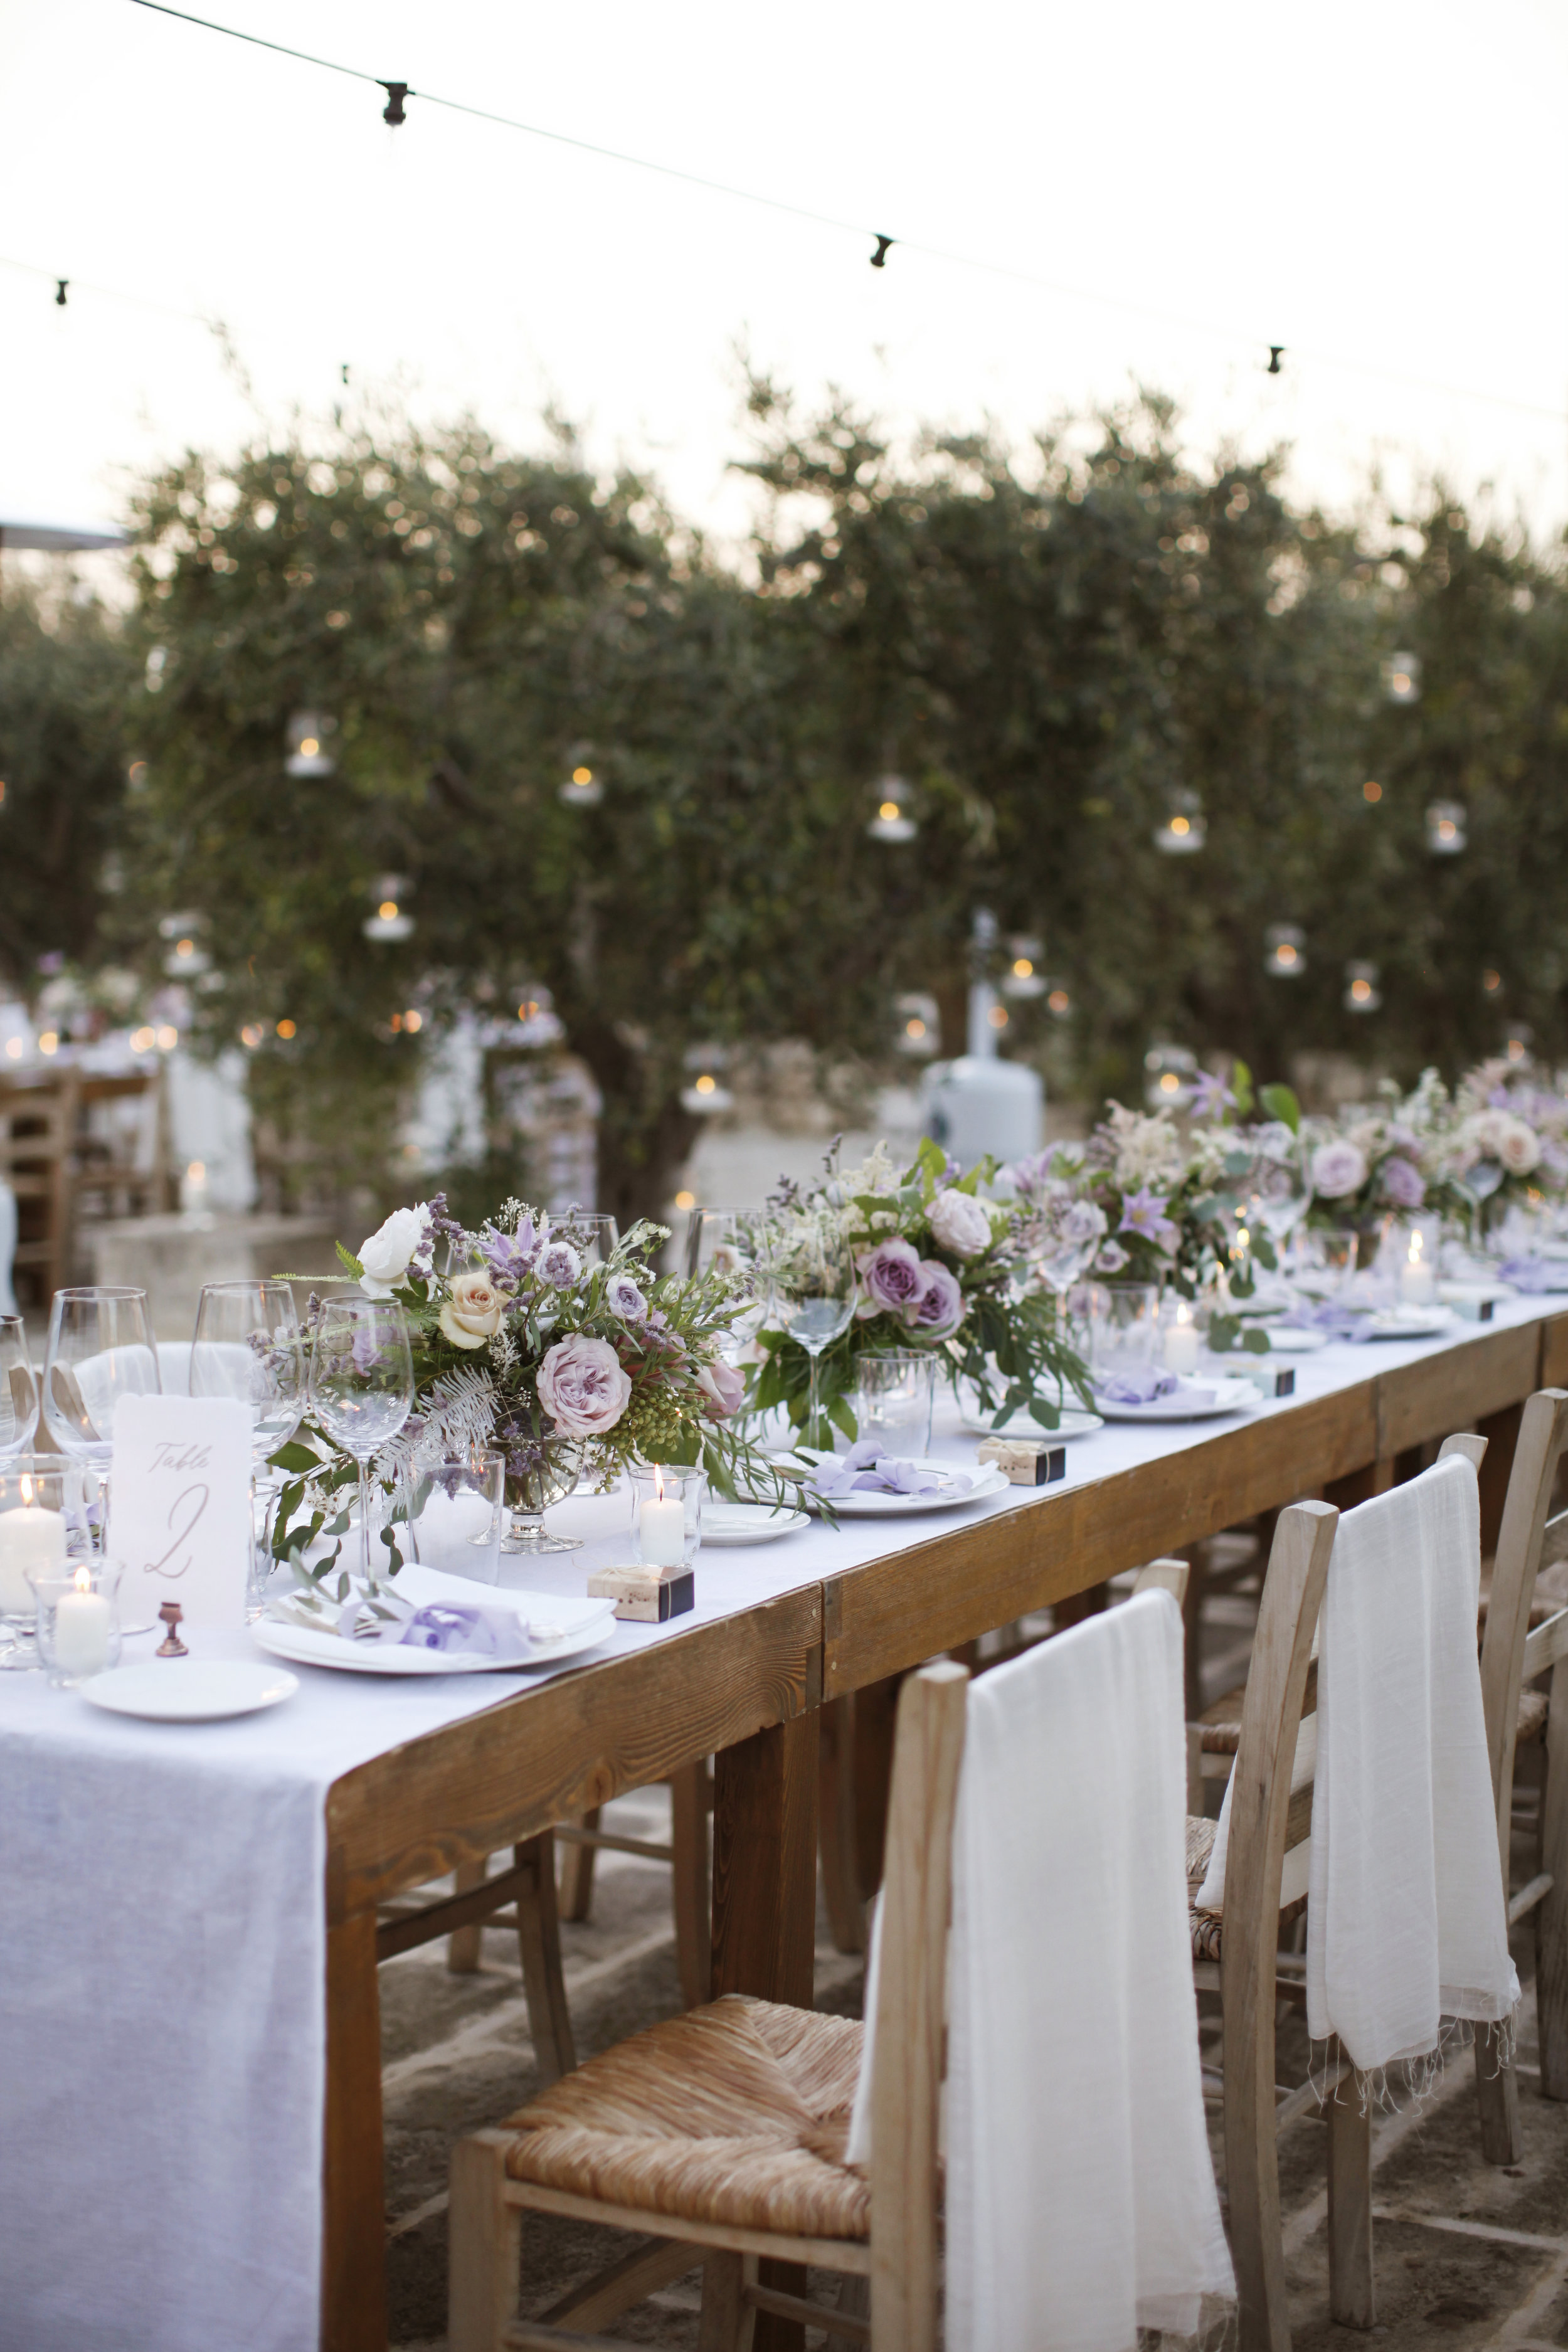 borgo egnazia wedding italy alison bryan 15